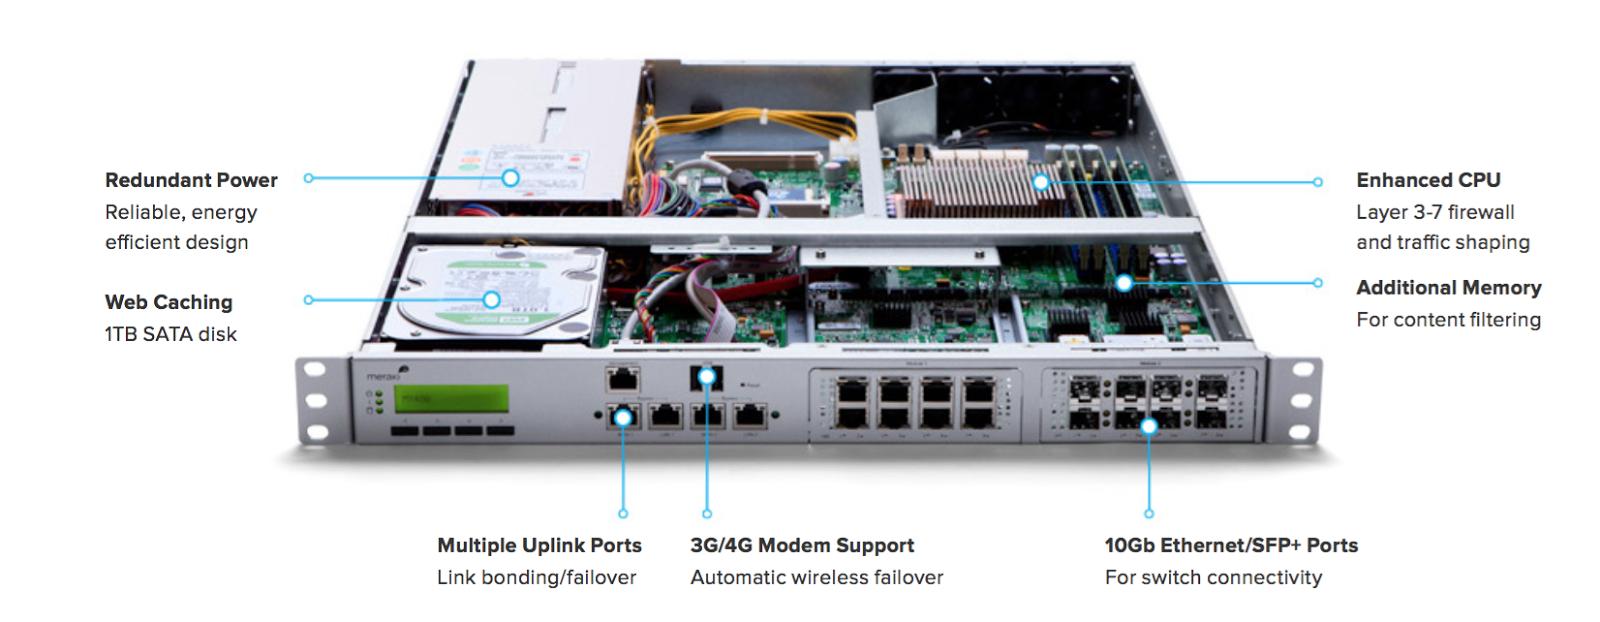 Inderdeep Singh Lll 3 5 Macsec On Catalyst 3750x Series Switch Configuration Example Cisco Fig 11 Meraki Mx Security Appliances